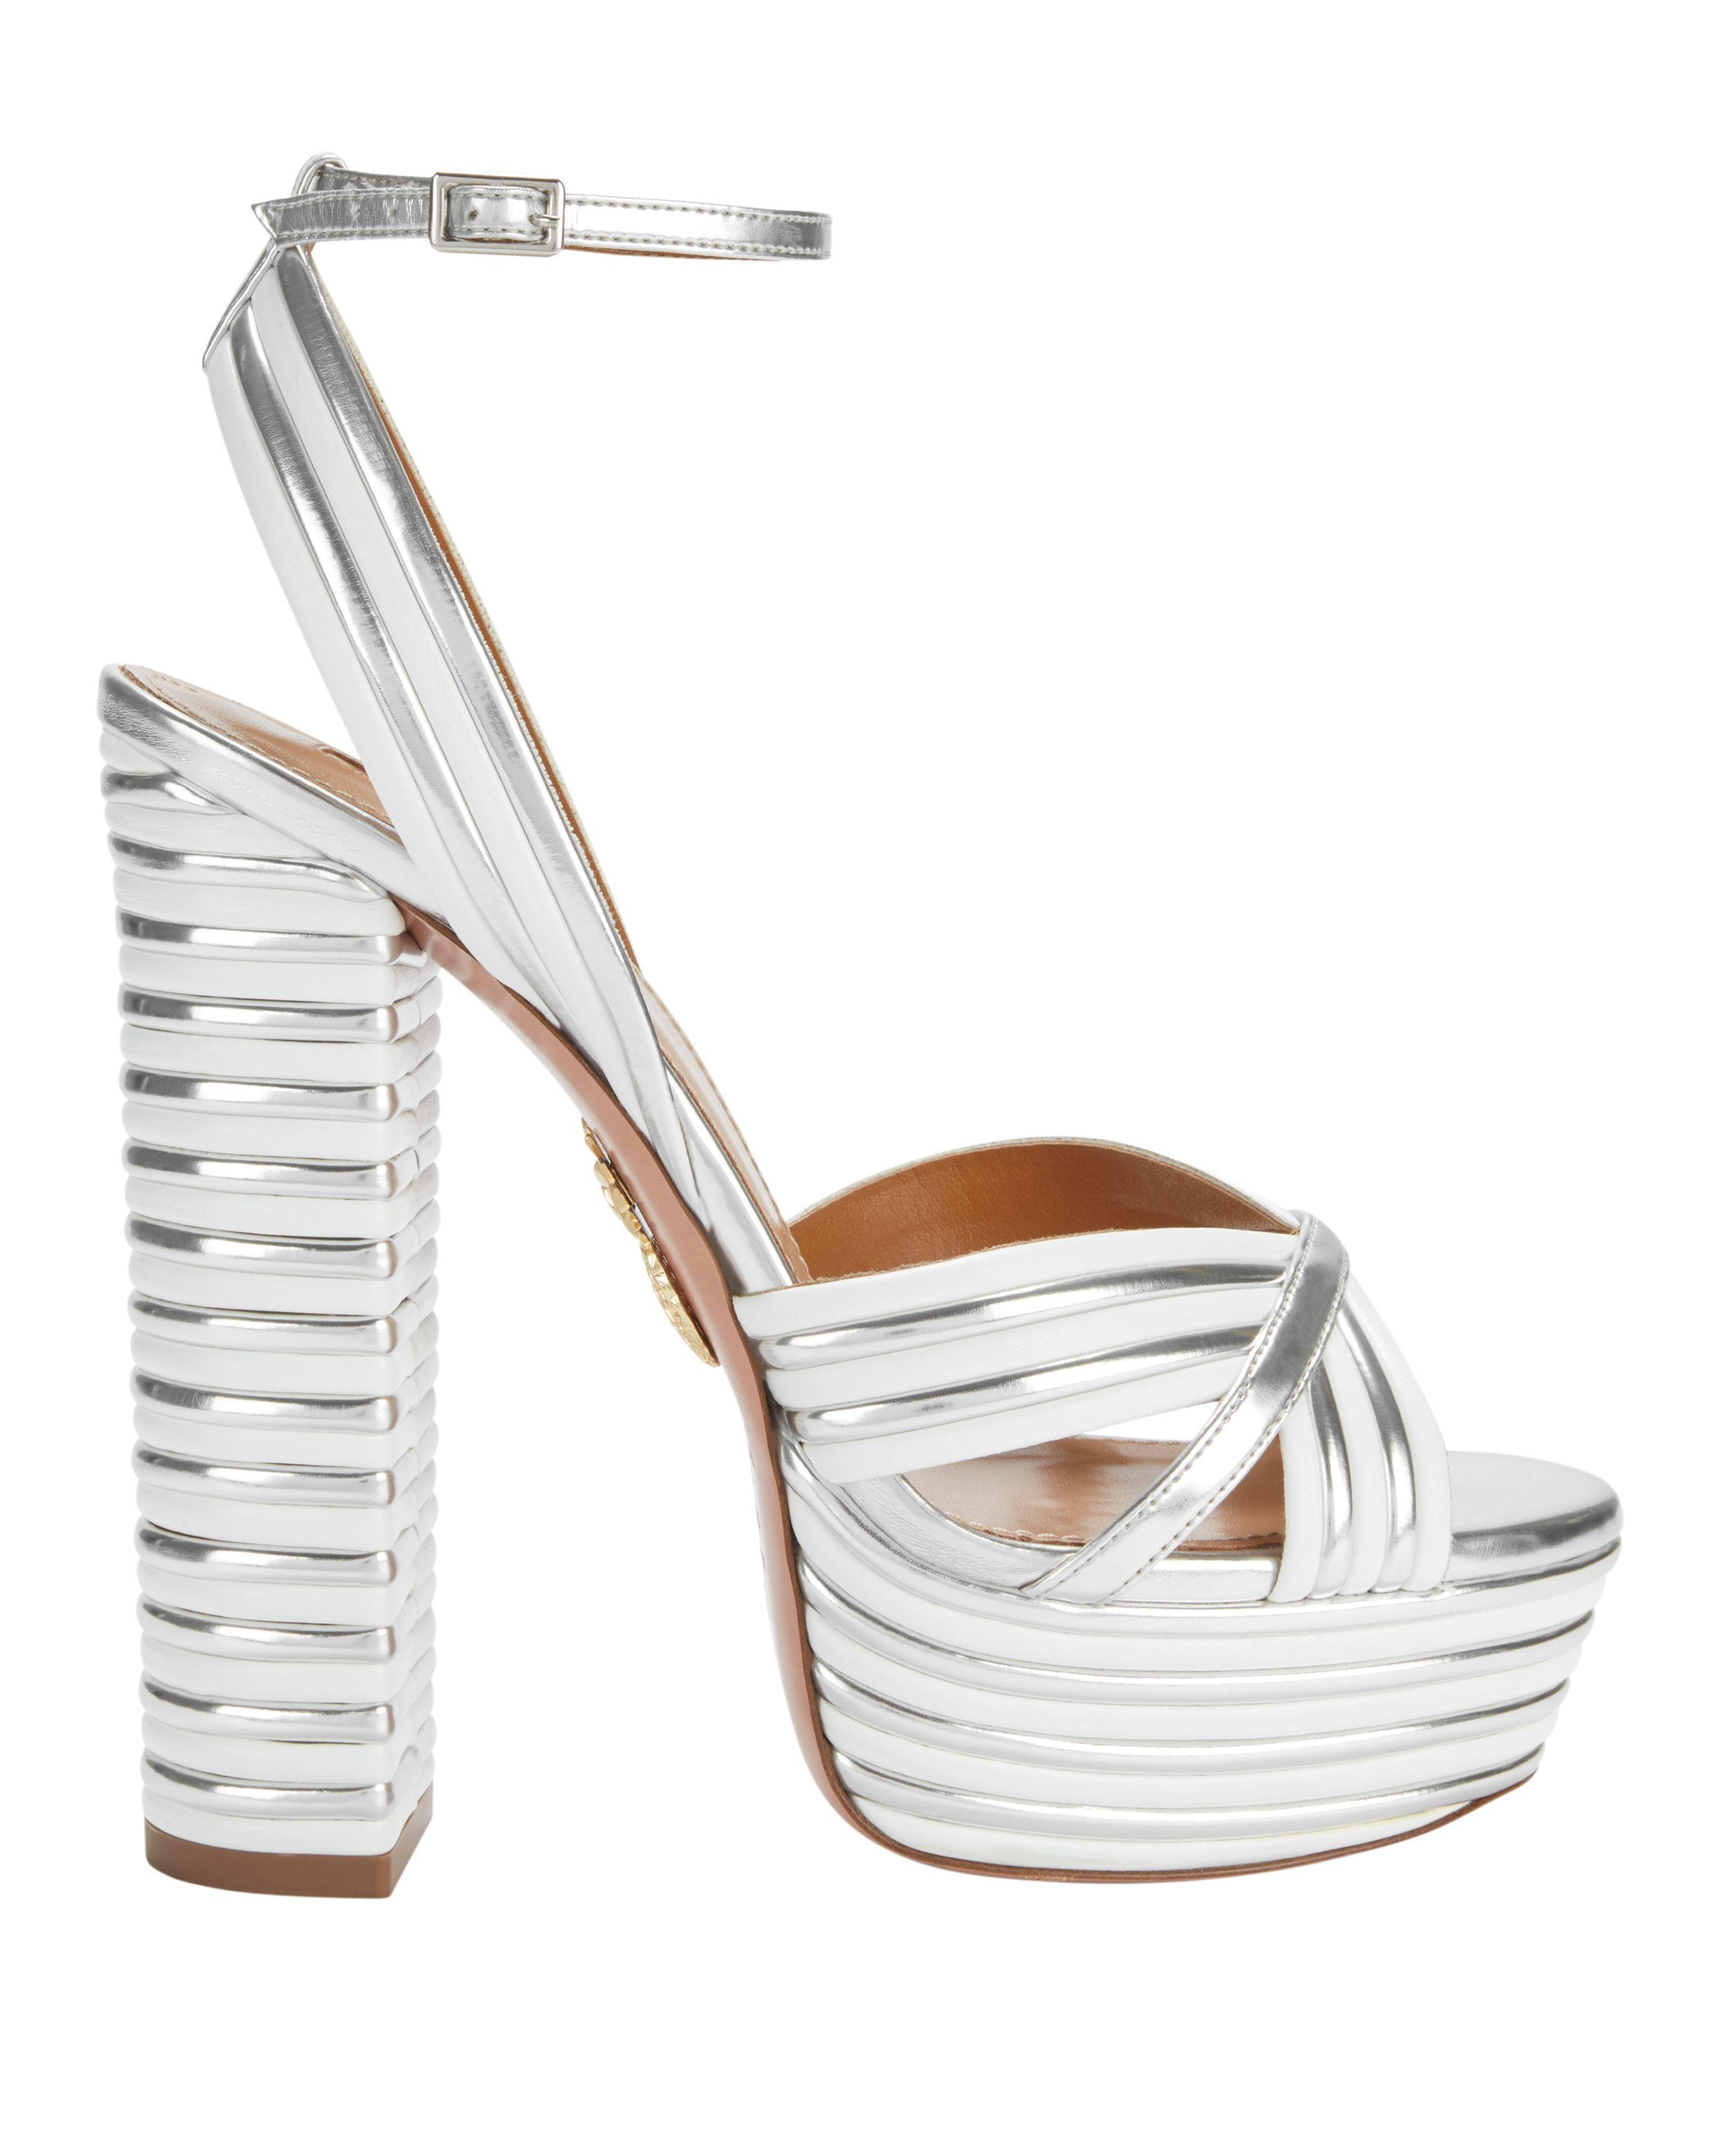 e59e597772 Sundance Silver Platform Sandals | H I G H - H E E L S A N D A L S ...